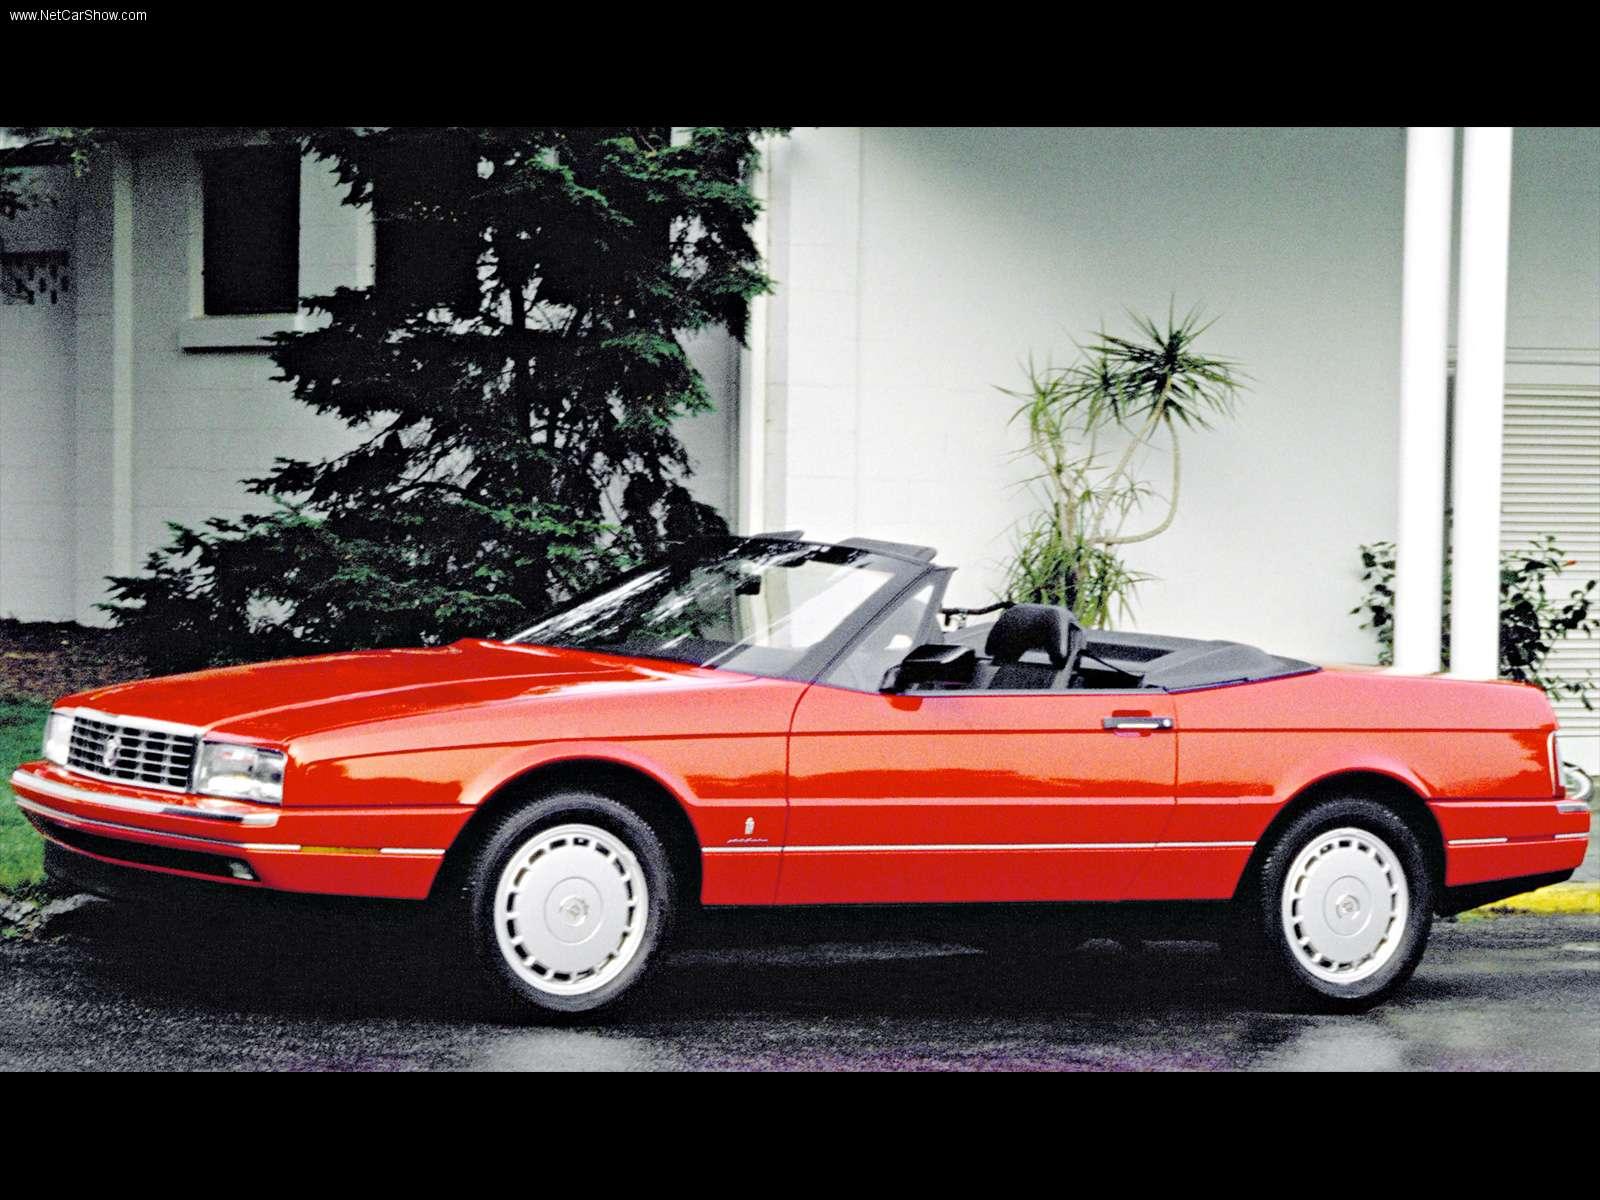 Cadillac Allanté history, photos on Better Parts LTD